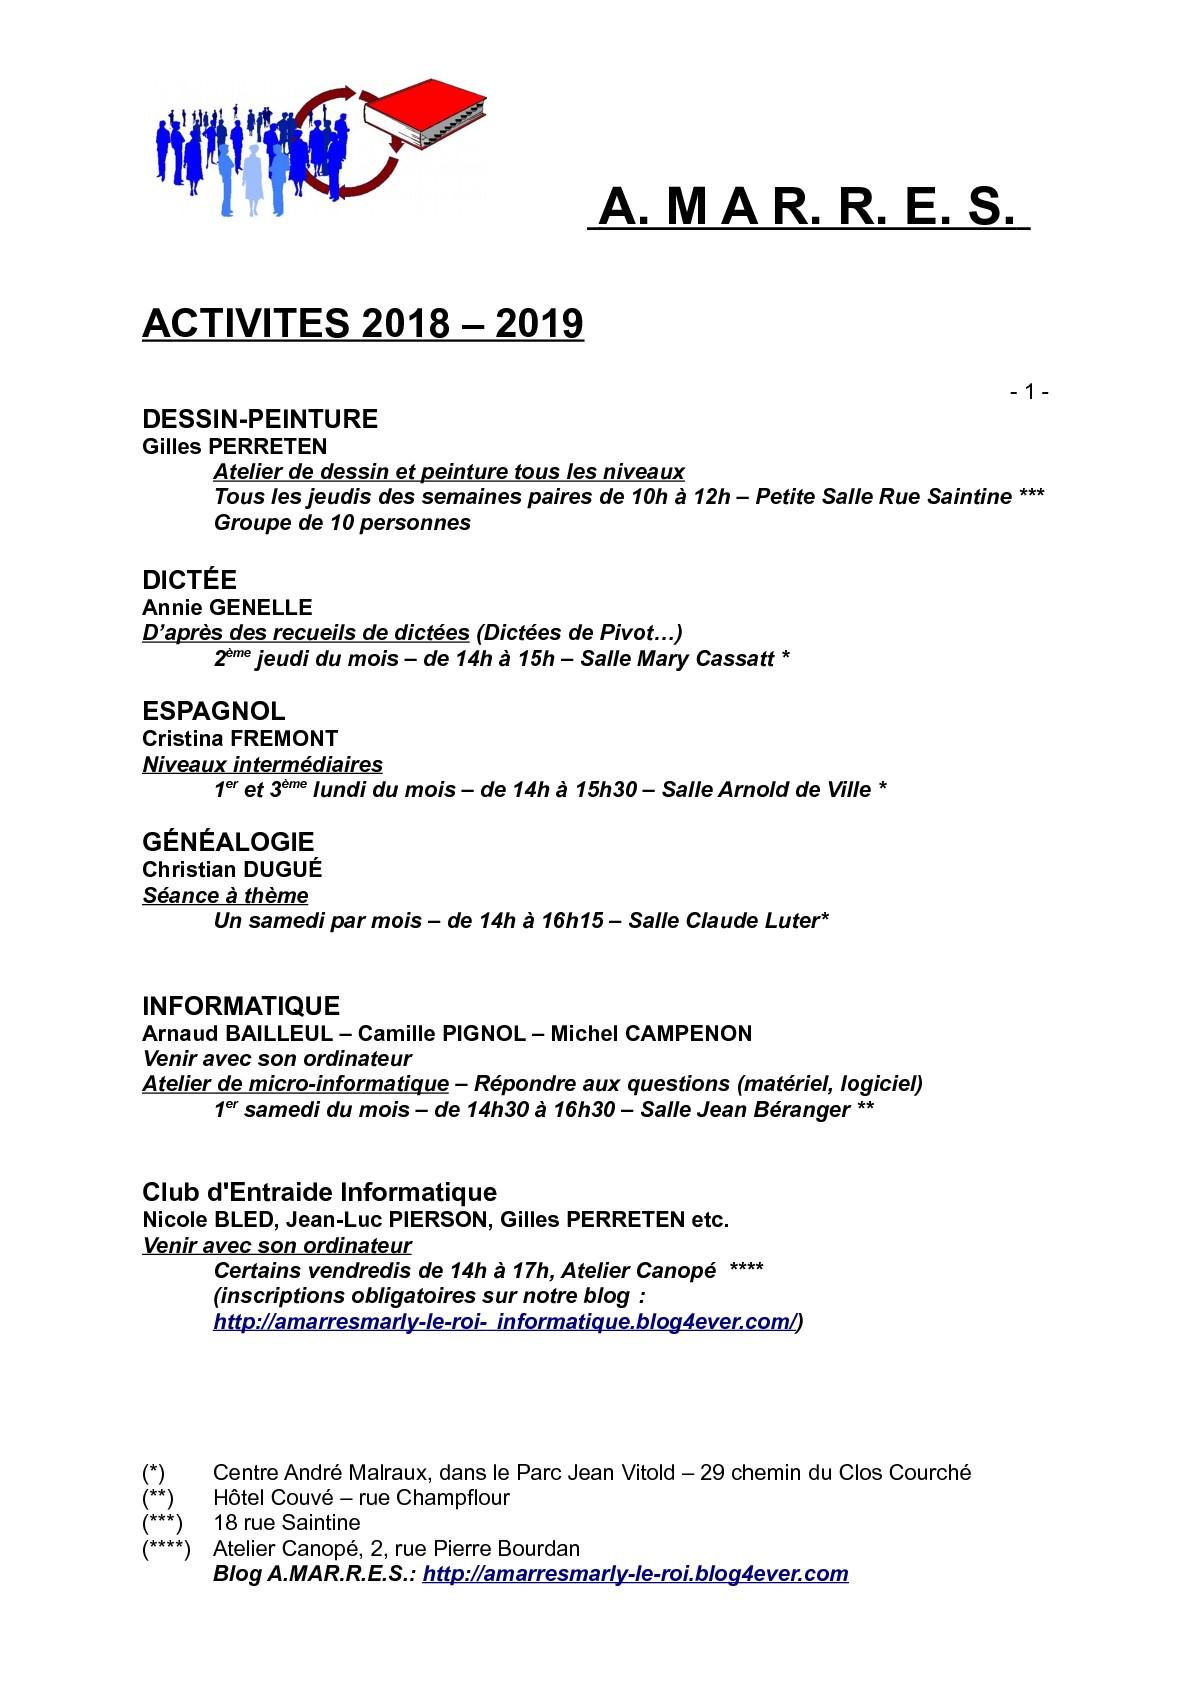 Nos activités 2018-2019 V2-002-002.jpg